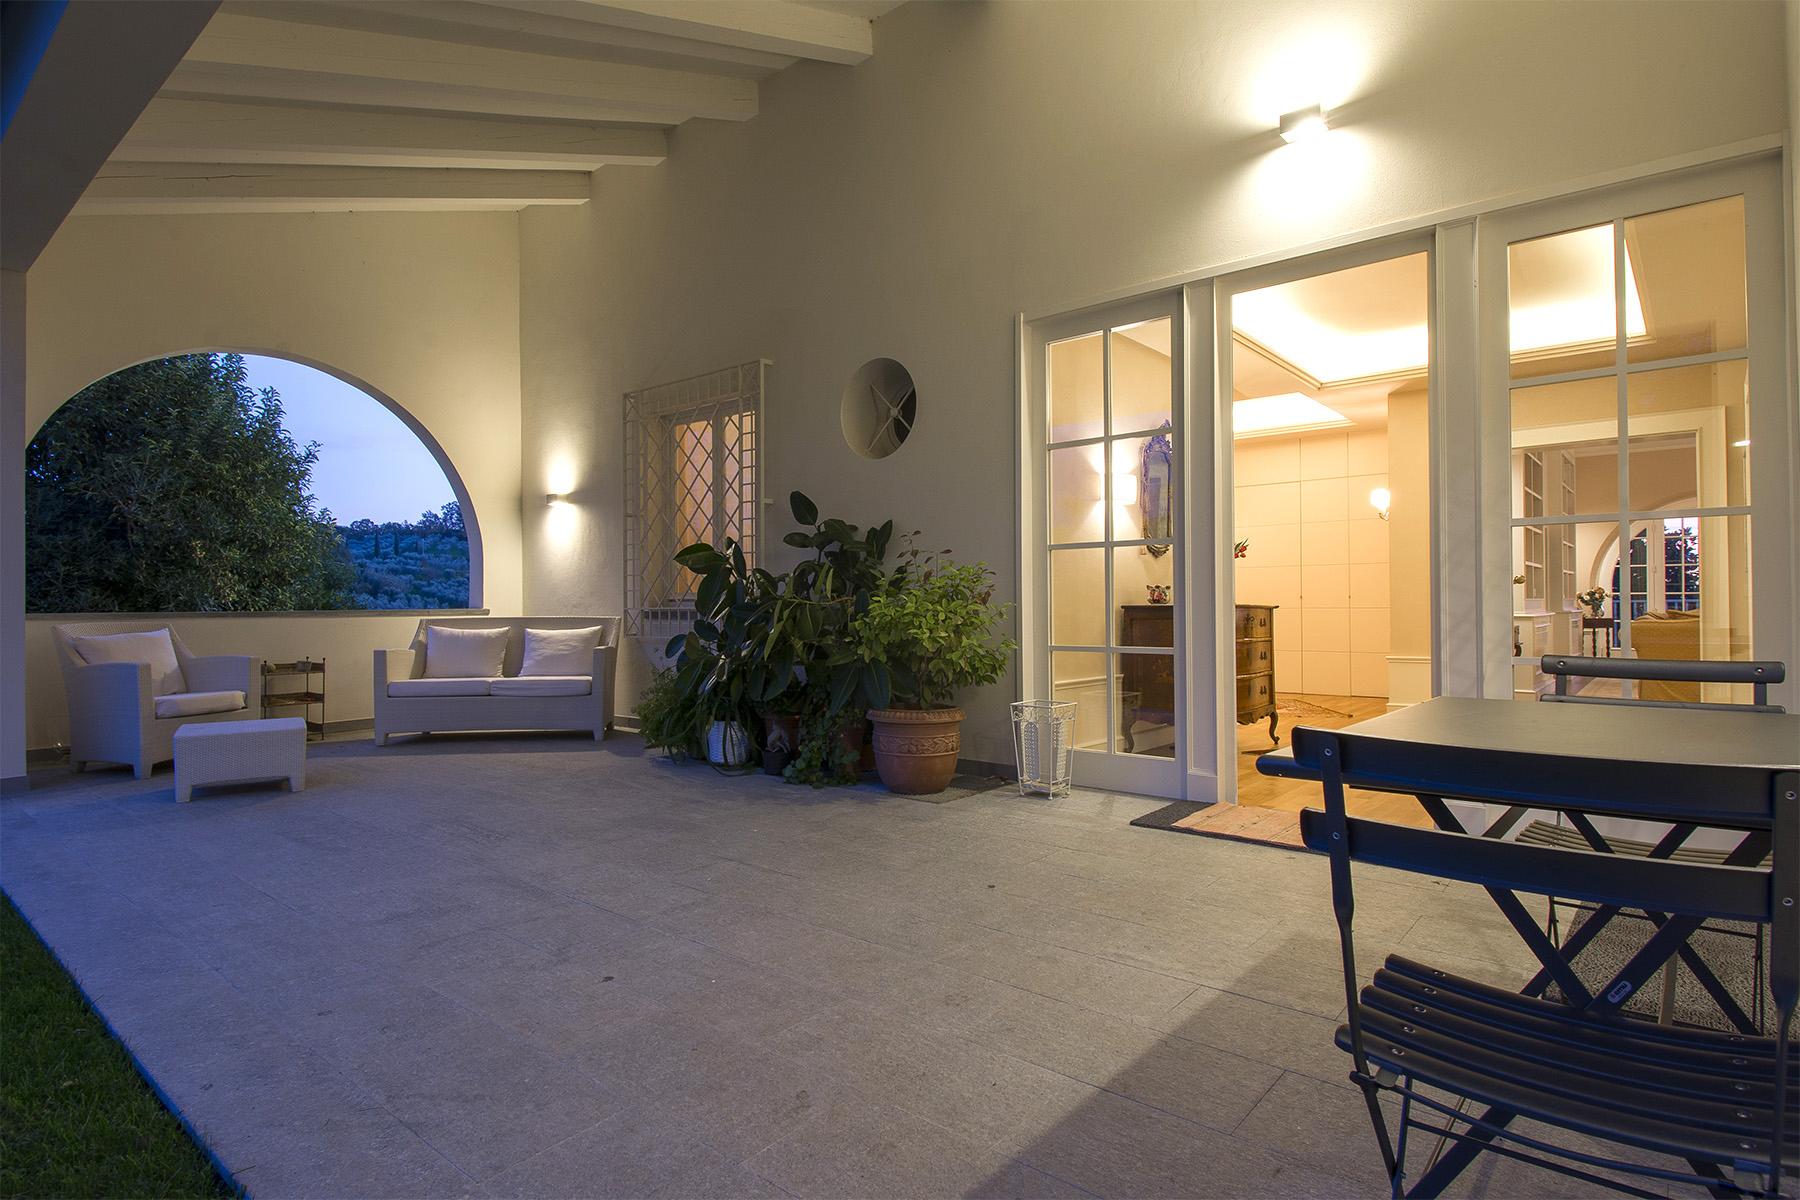 Villa in Vendita a Lucca: 5 locali, 470 mq - Foto 21